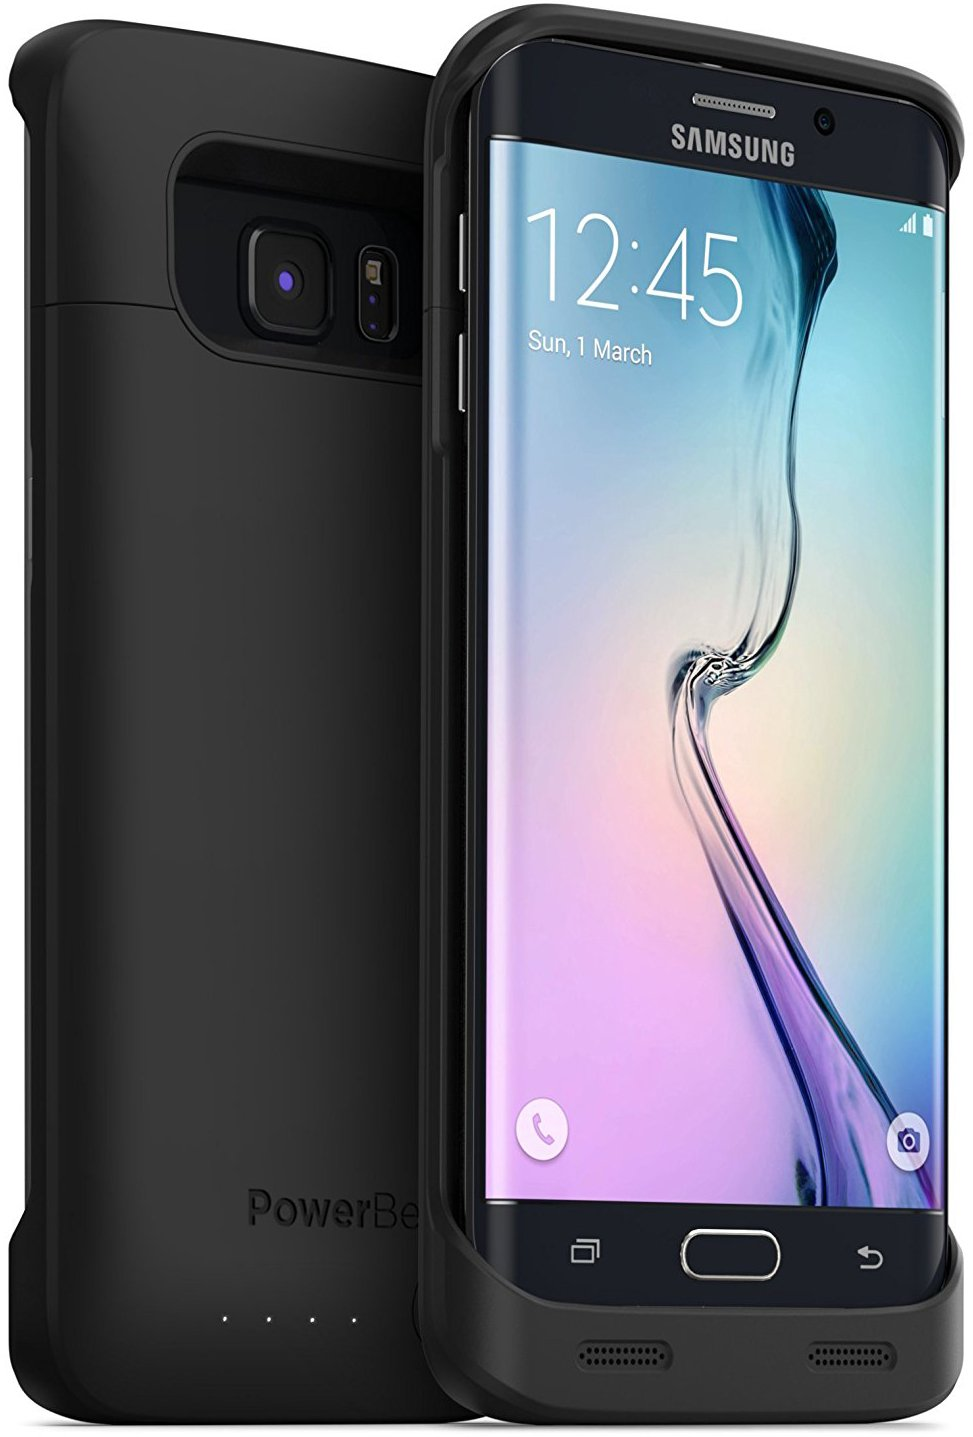 big sale f4b4d 8cf80 PowerBear Samsung Galaxy S6 Edge Battery Case [3500 mAh] External Battery  Charger for The Galaxy S6 Edge (Up to 1.35X Extra Battery) - Black [24  Month ...